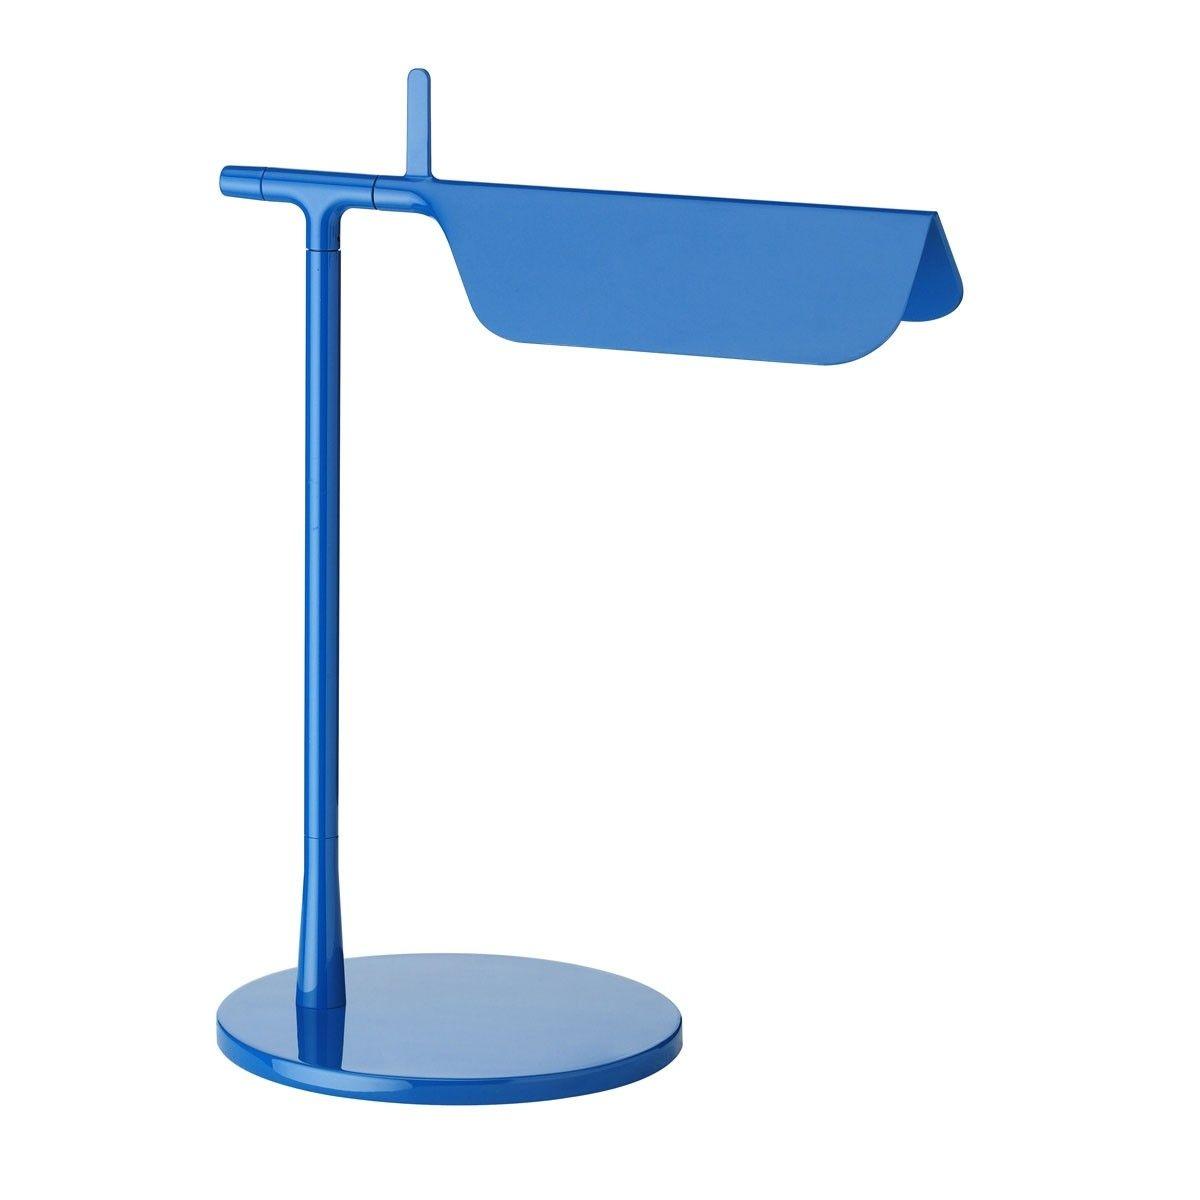 replica lighting. Flos Tab T LED Table Desk Lamp Replica Lighting